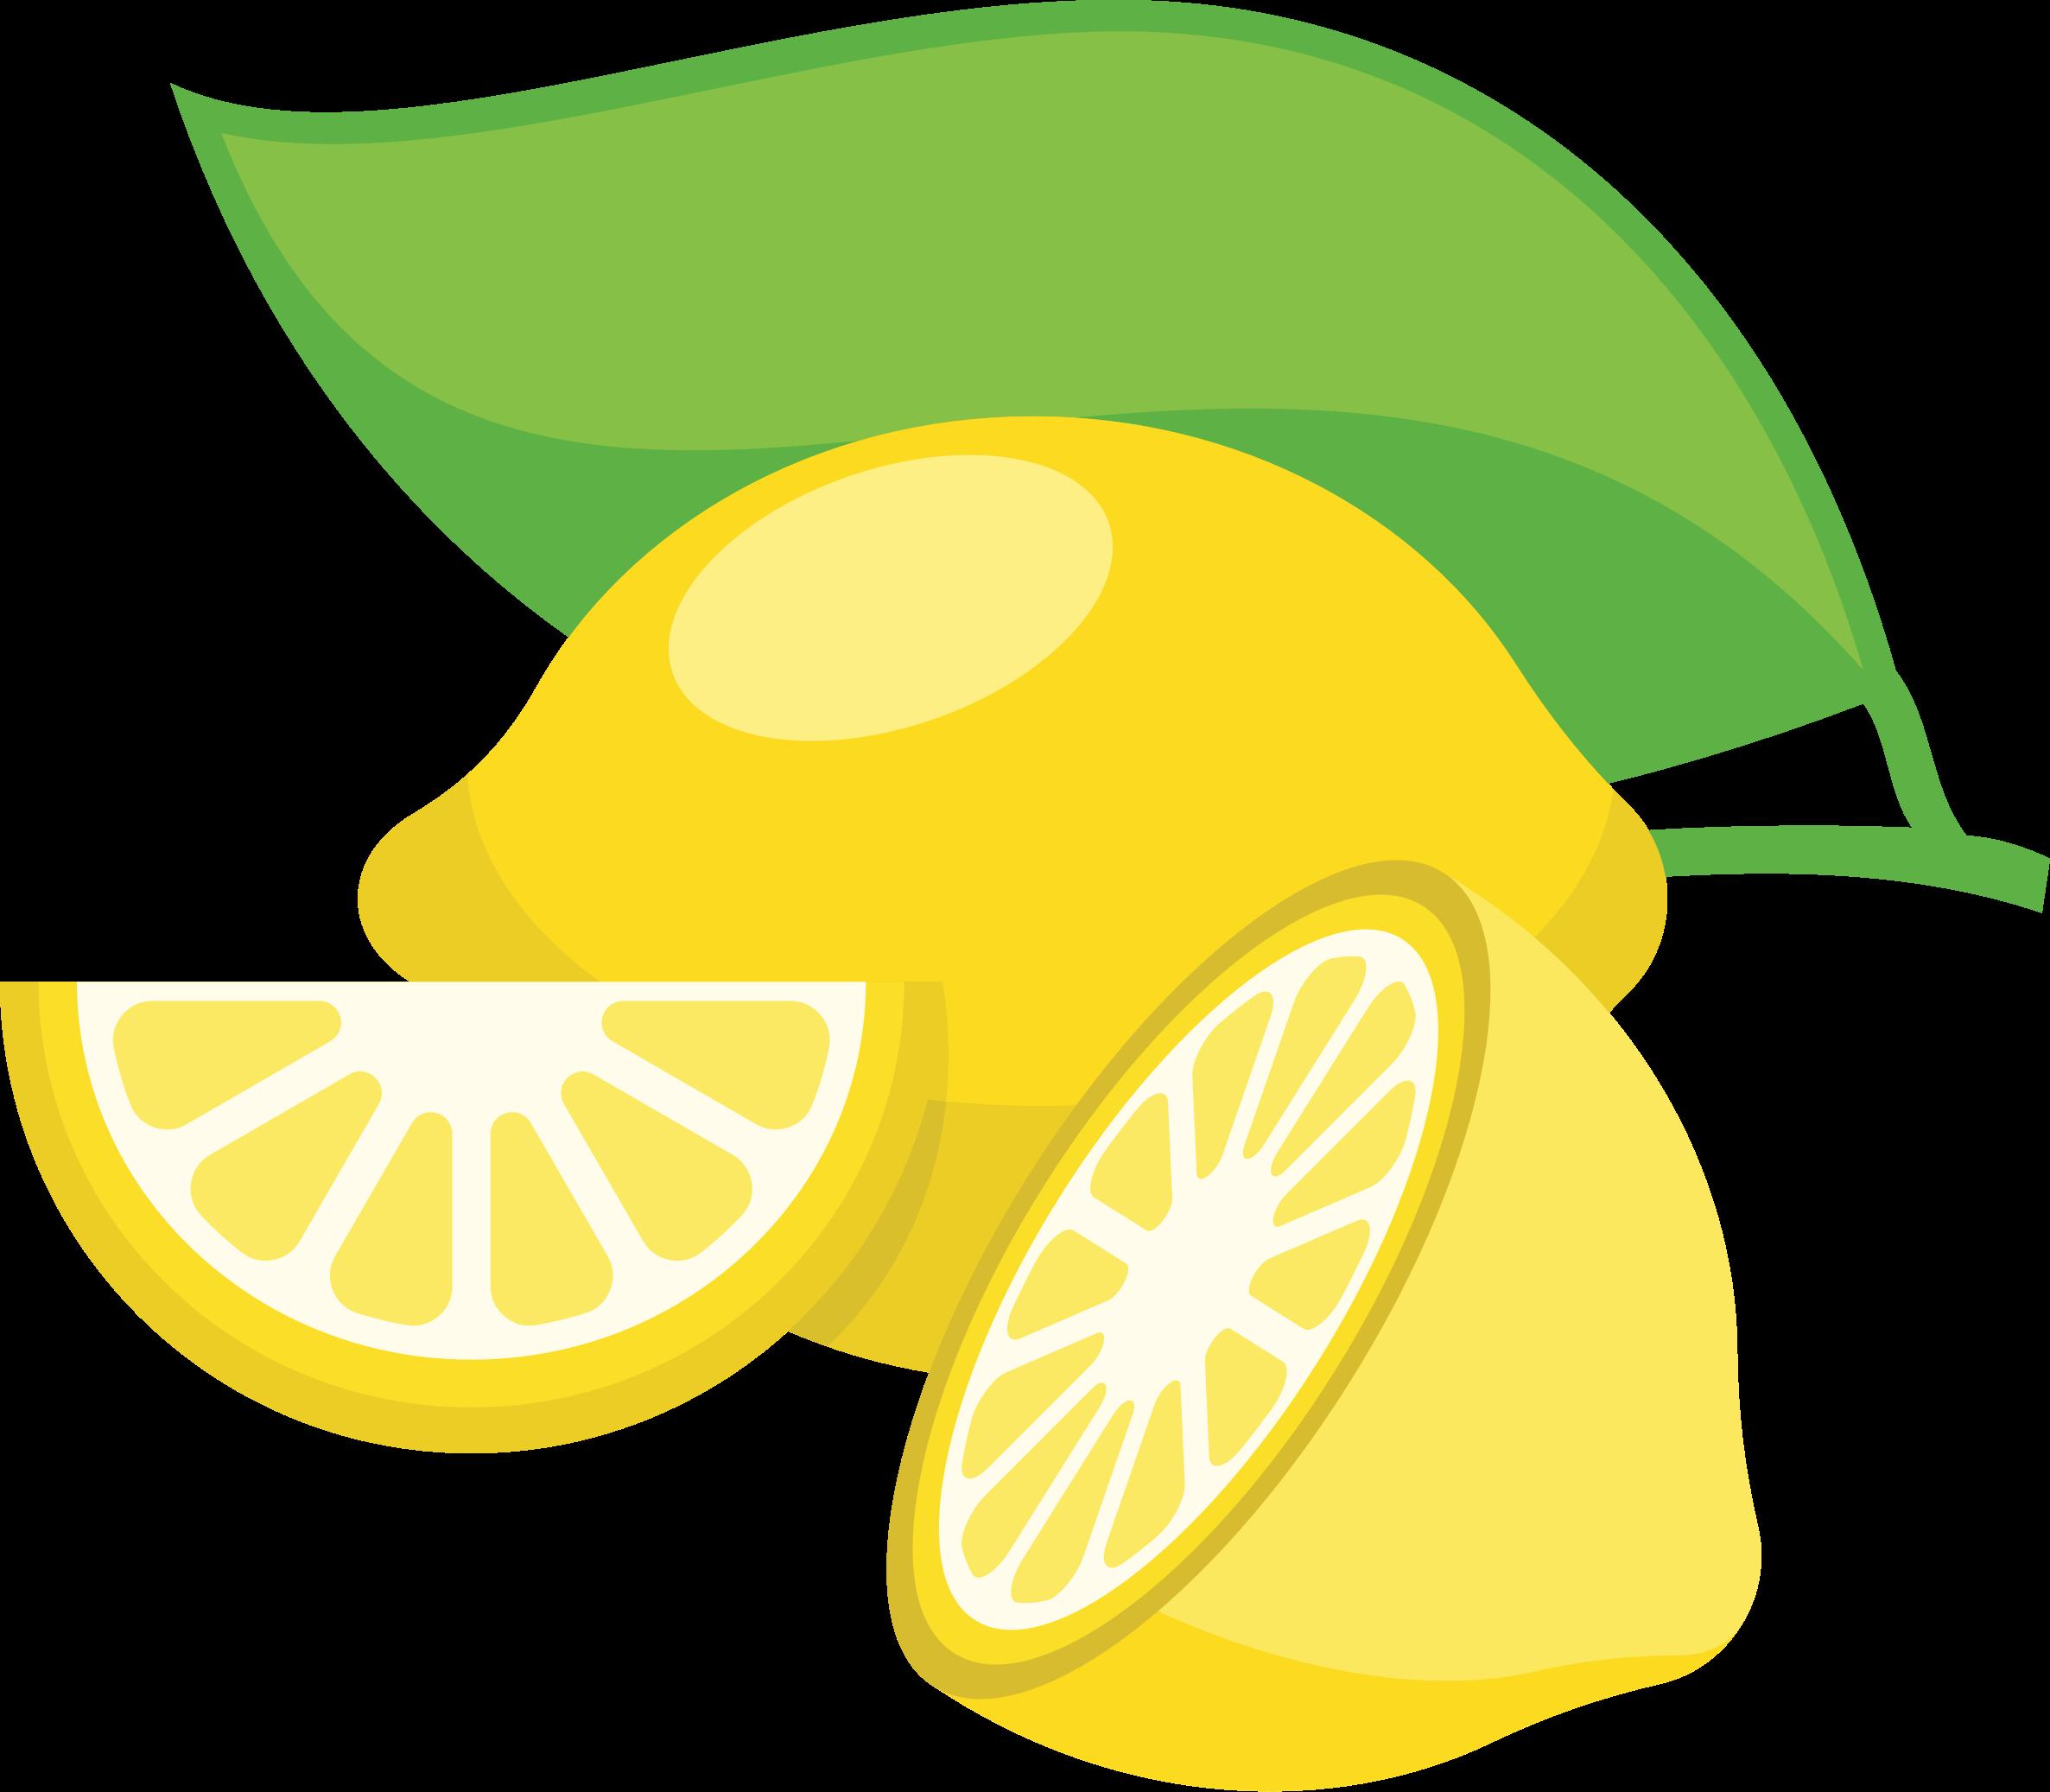 Big image png. Lemons clipart